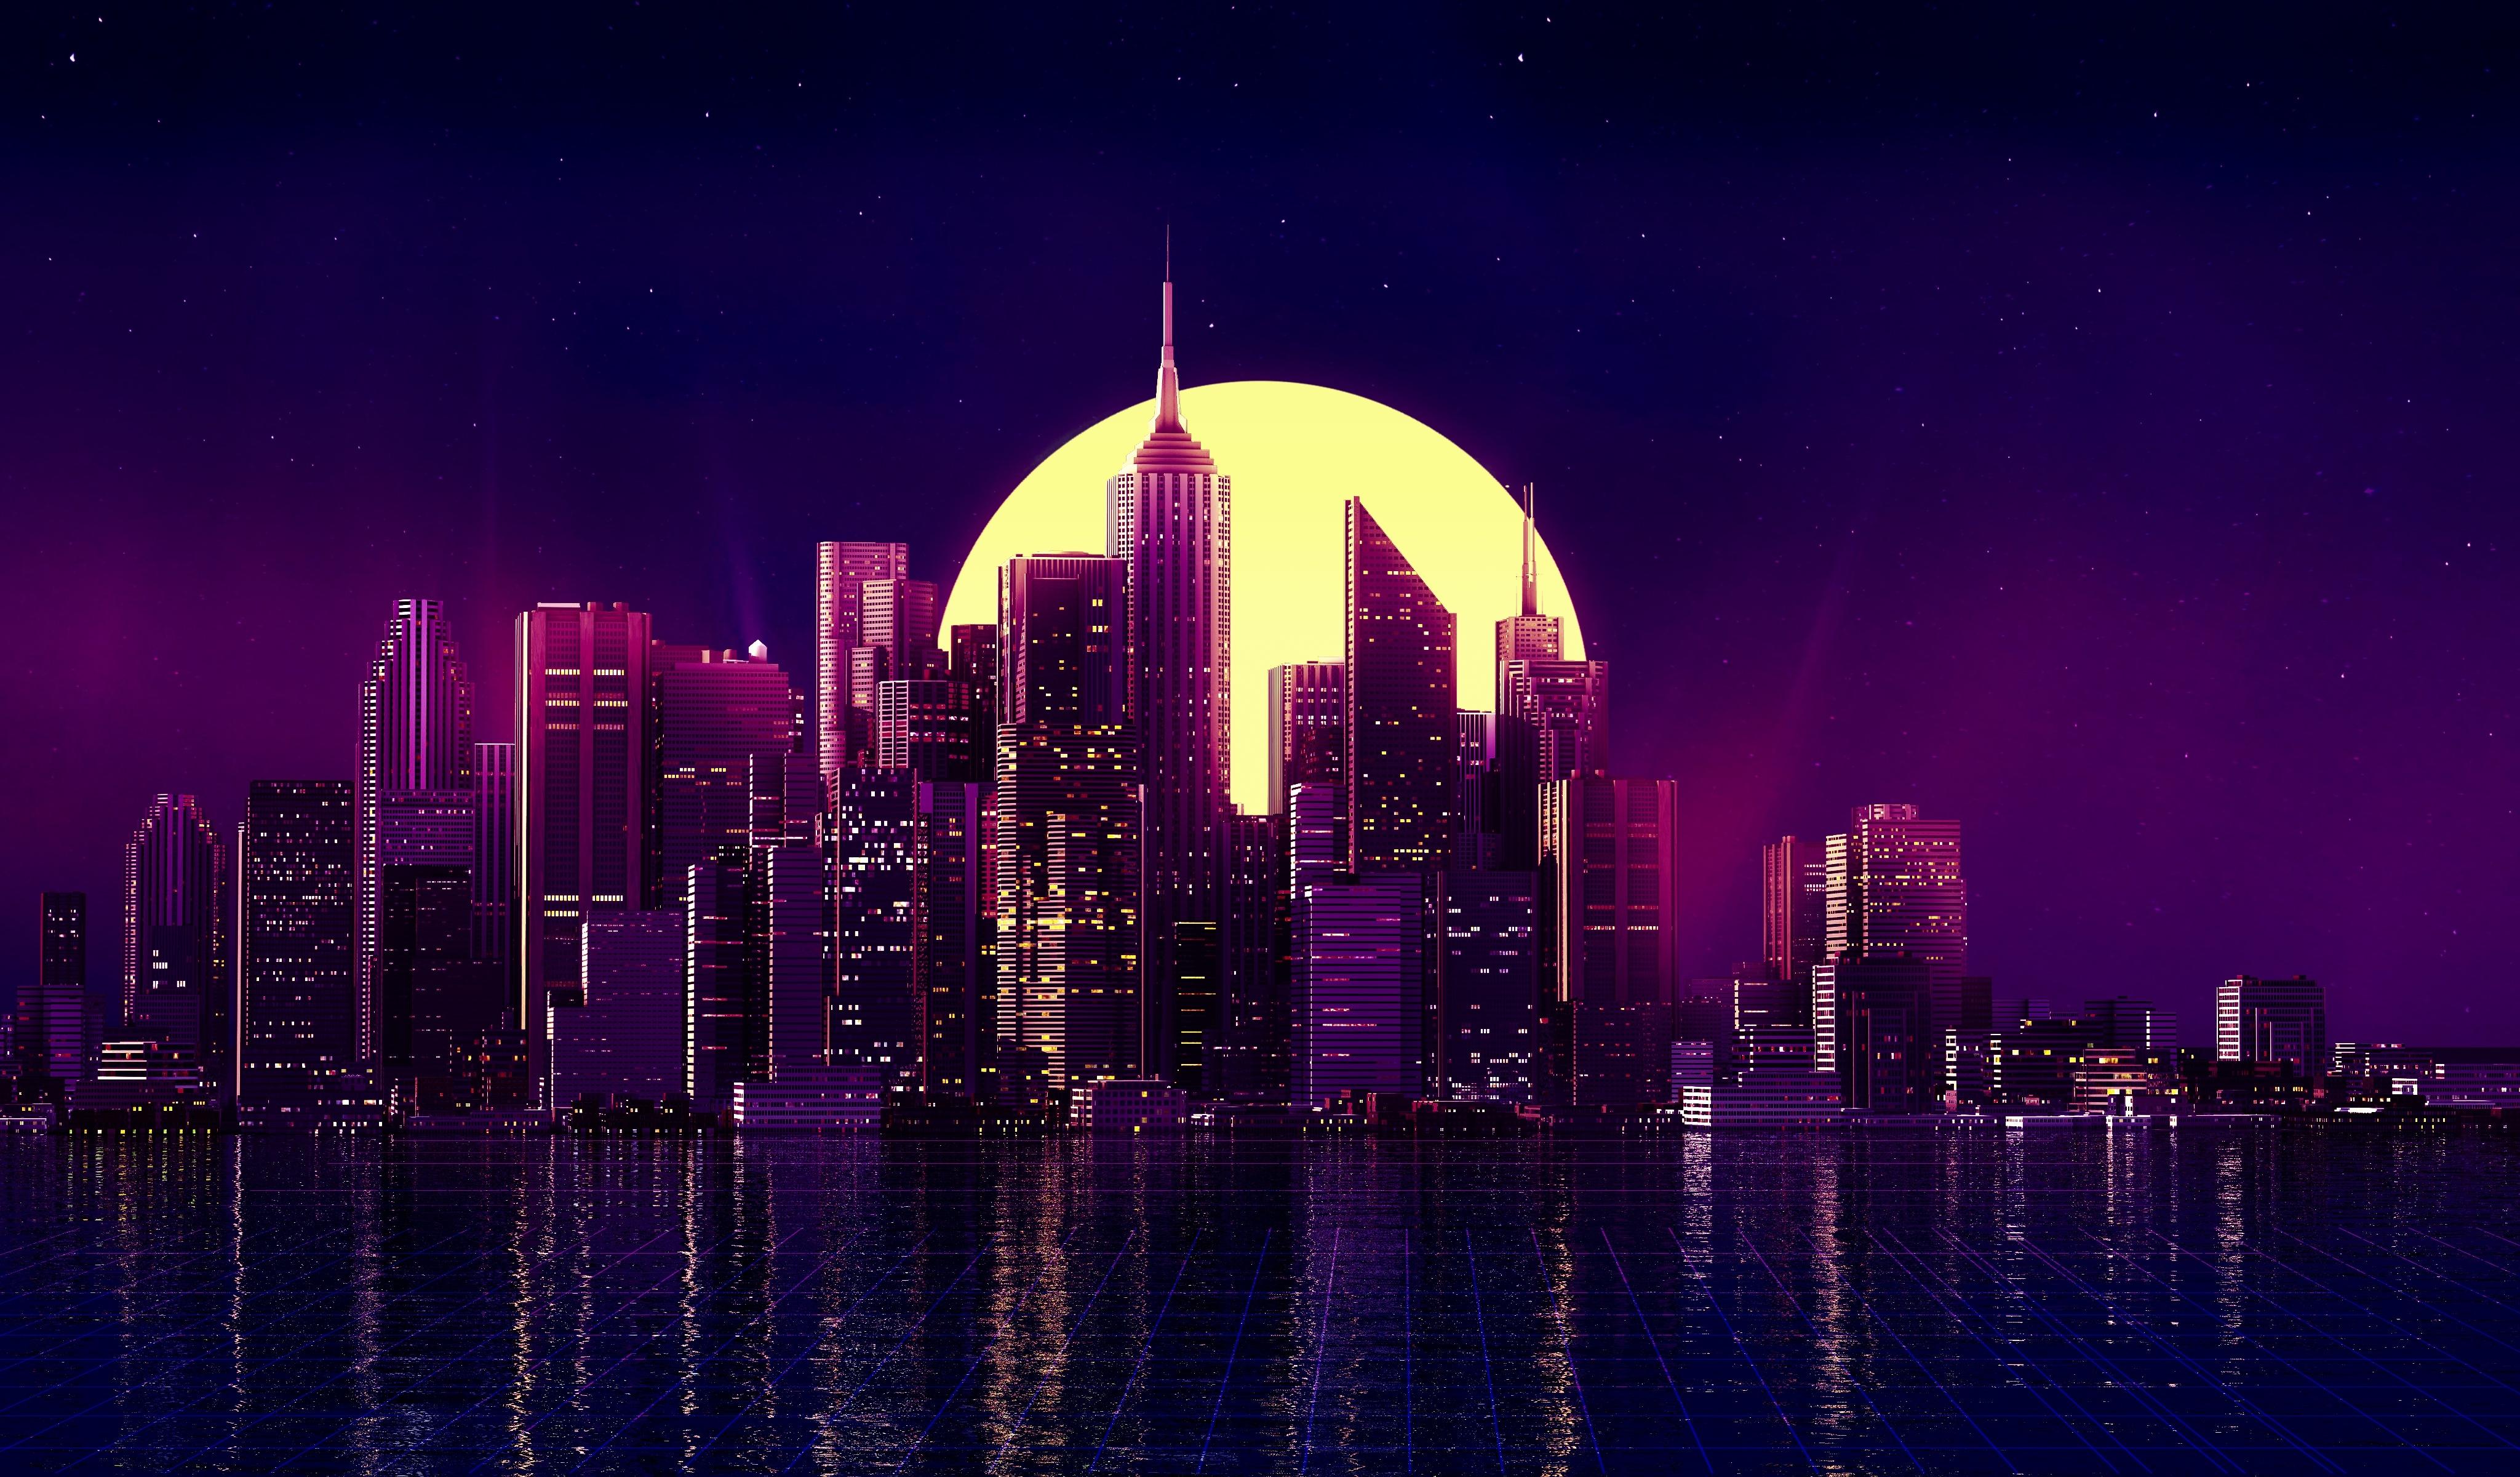 Neon New York City Wallpaper Hd City 4k Wallpapers Images